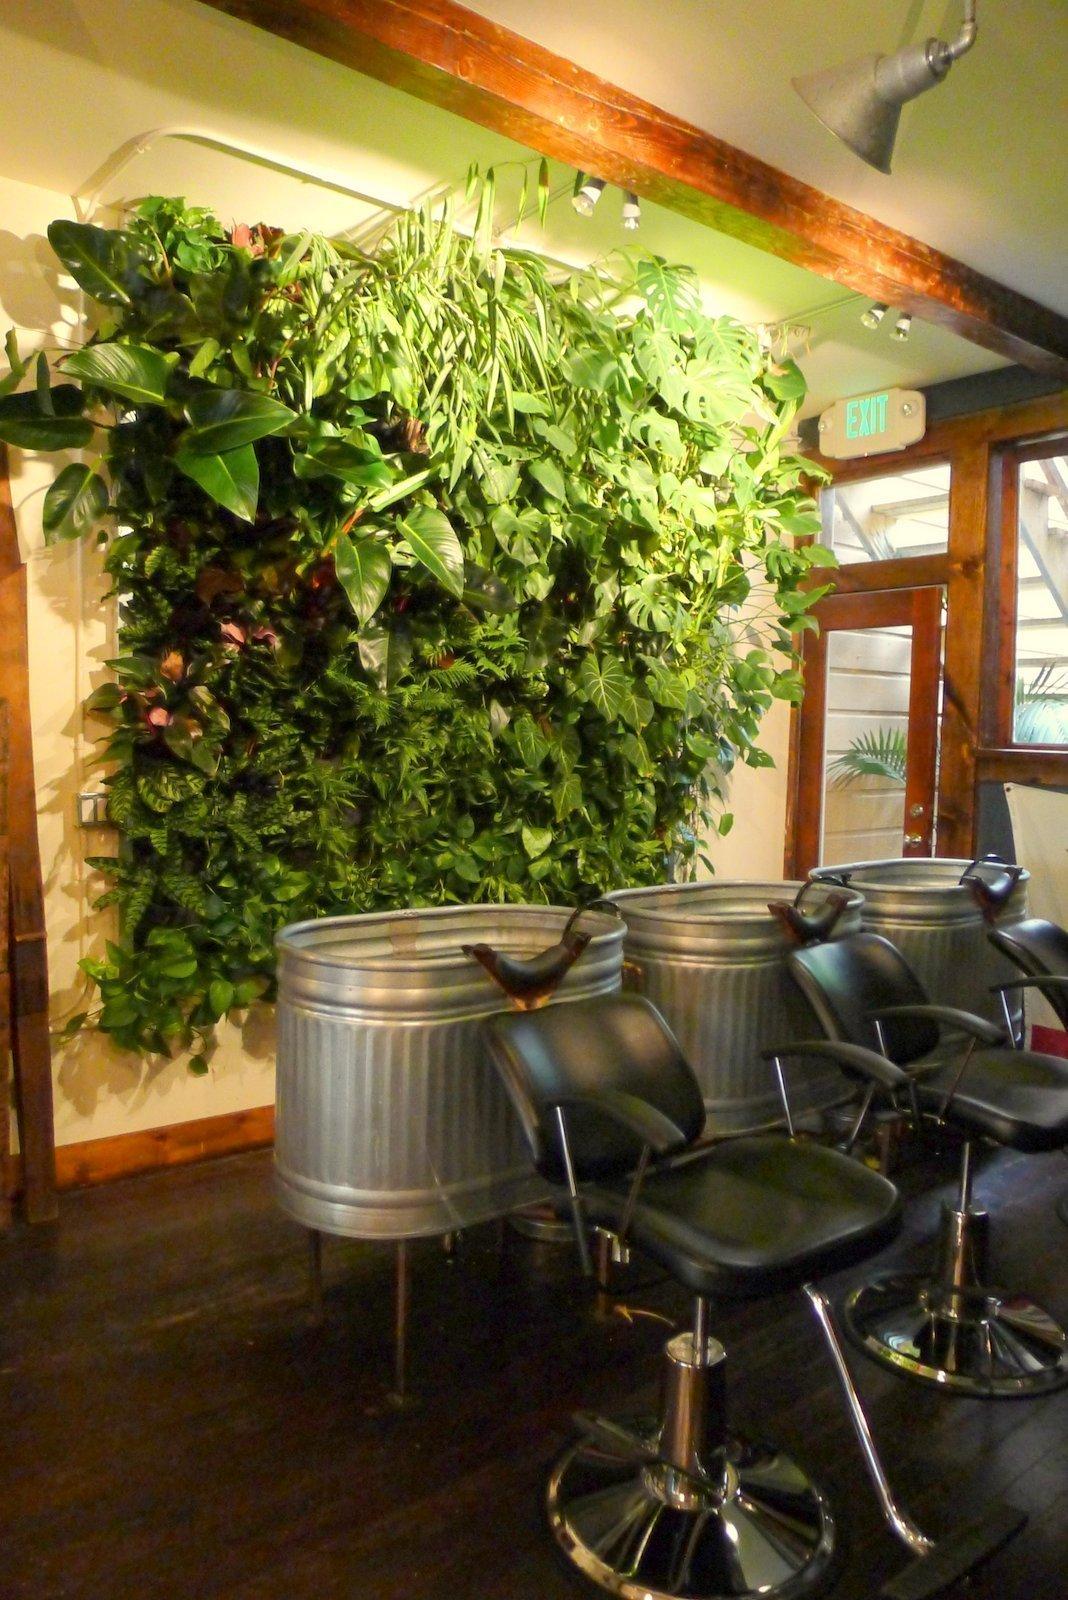 Population hair salon vertical jungle plants on walls for Garden salon